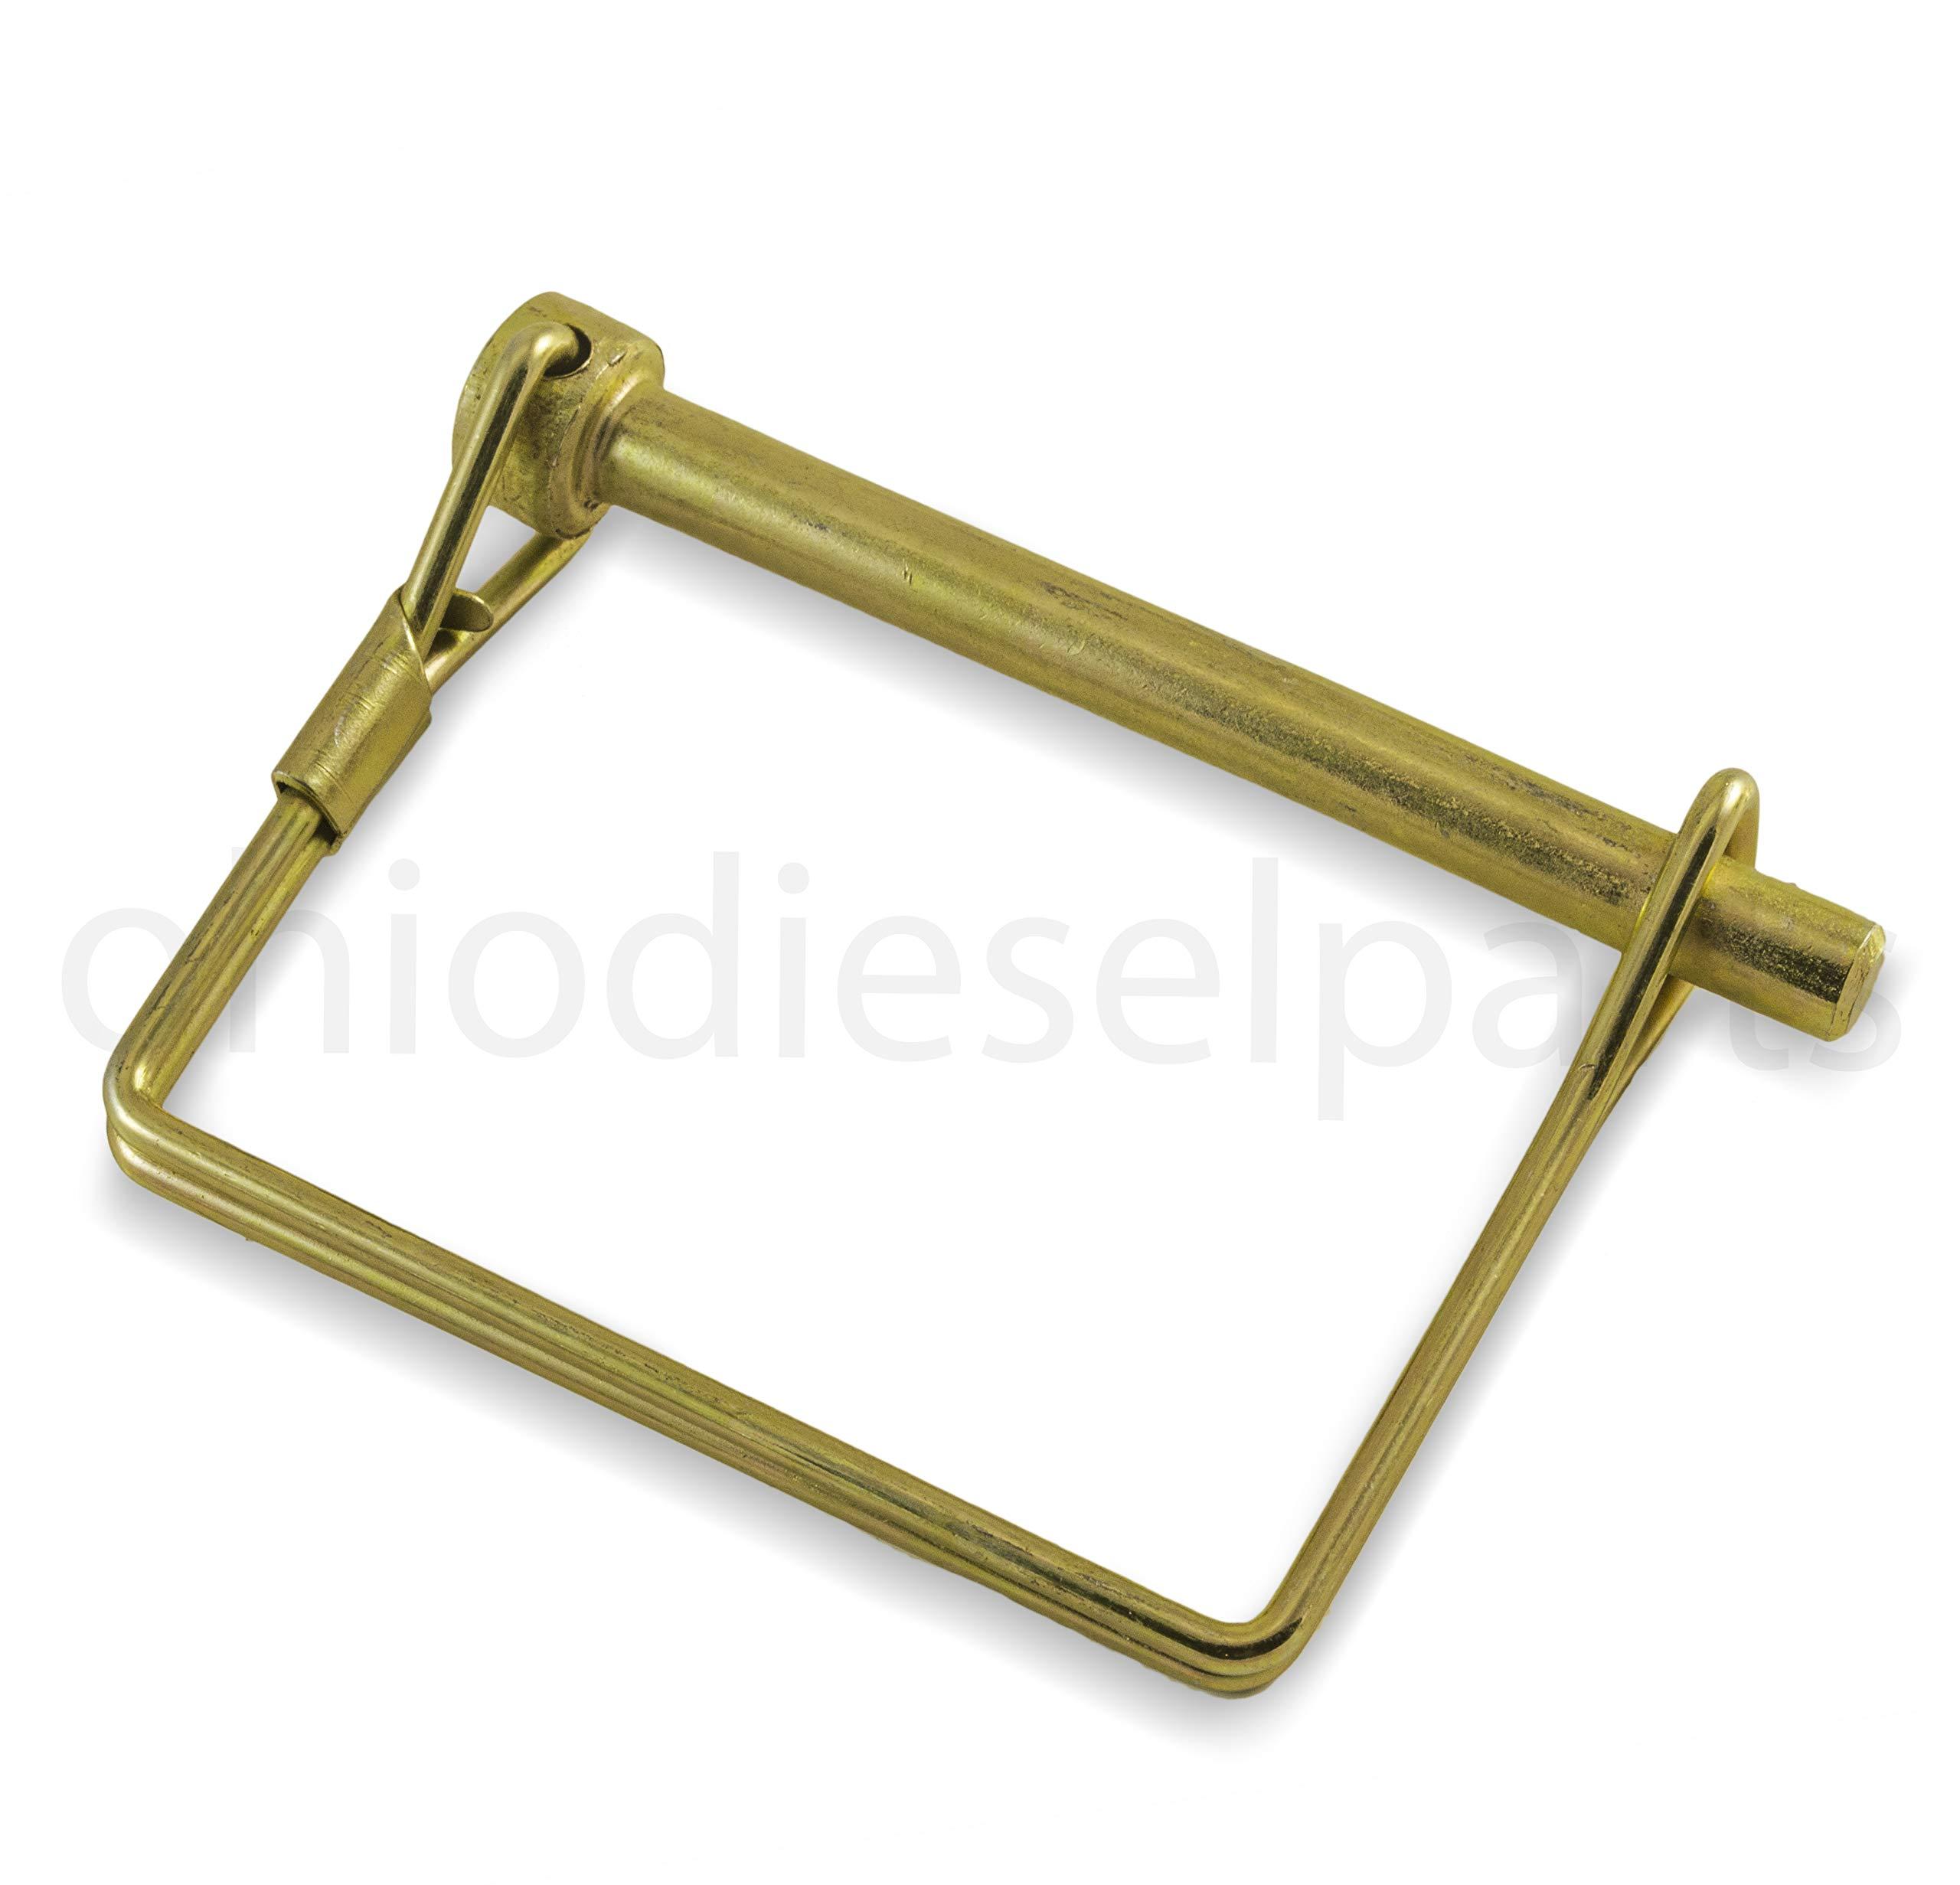 PTO Square Shaft Locking Pin 1/4'' x 2-1/4'' (Pack of 10)